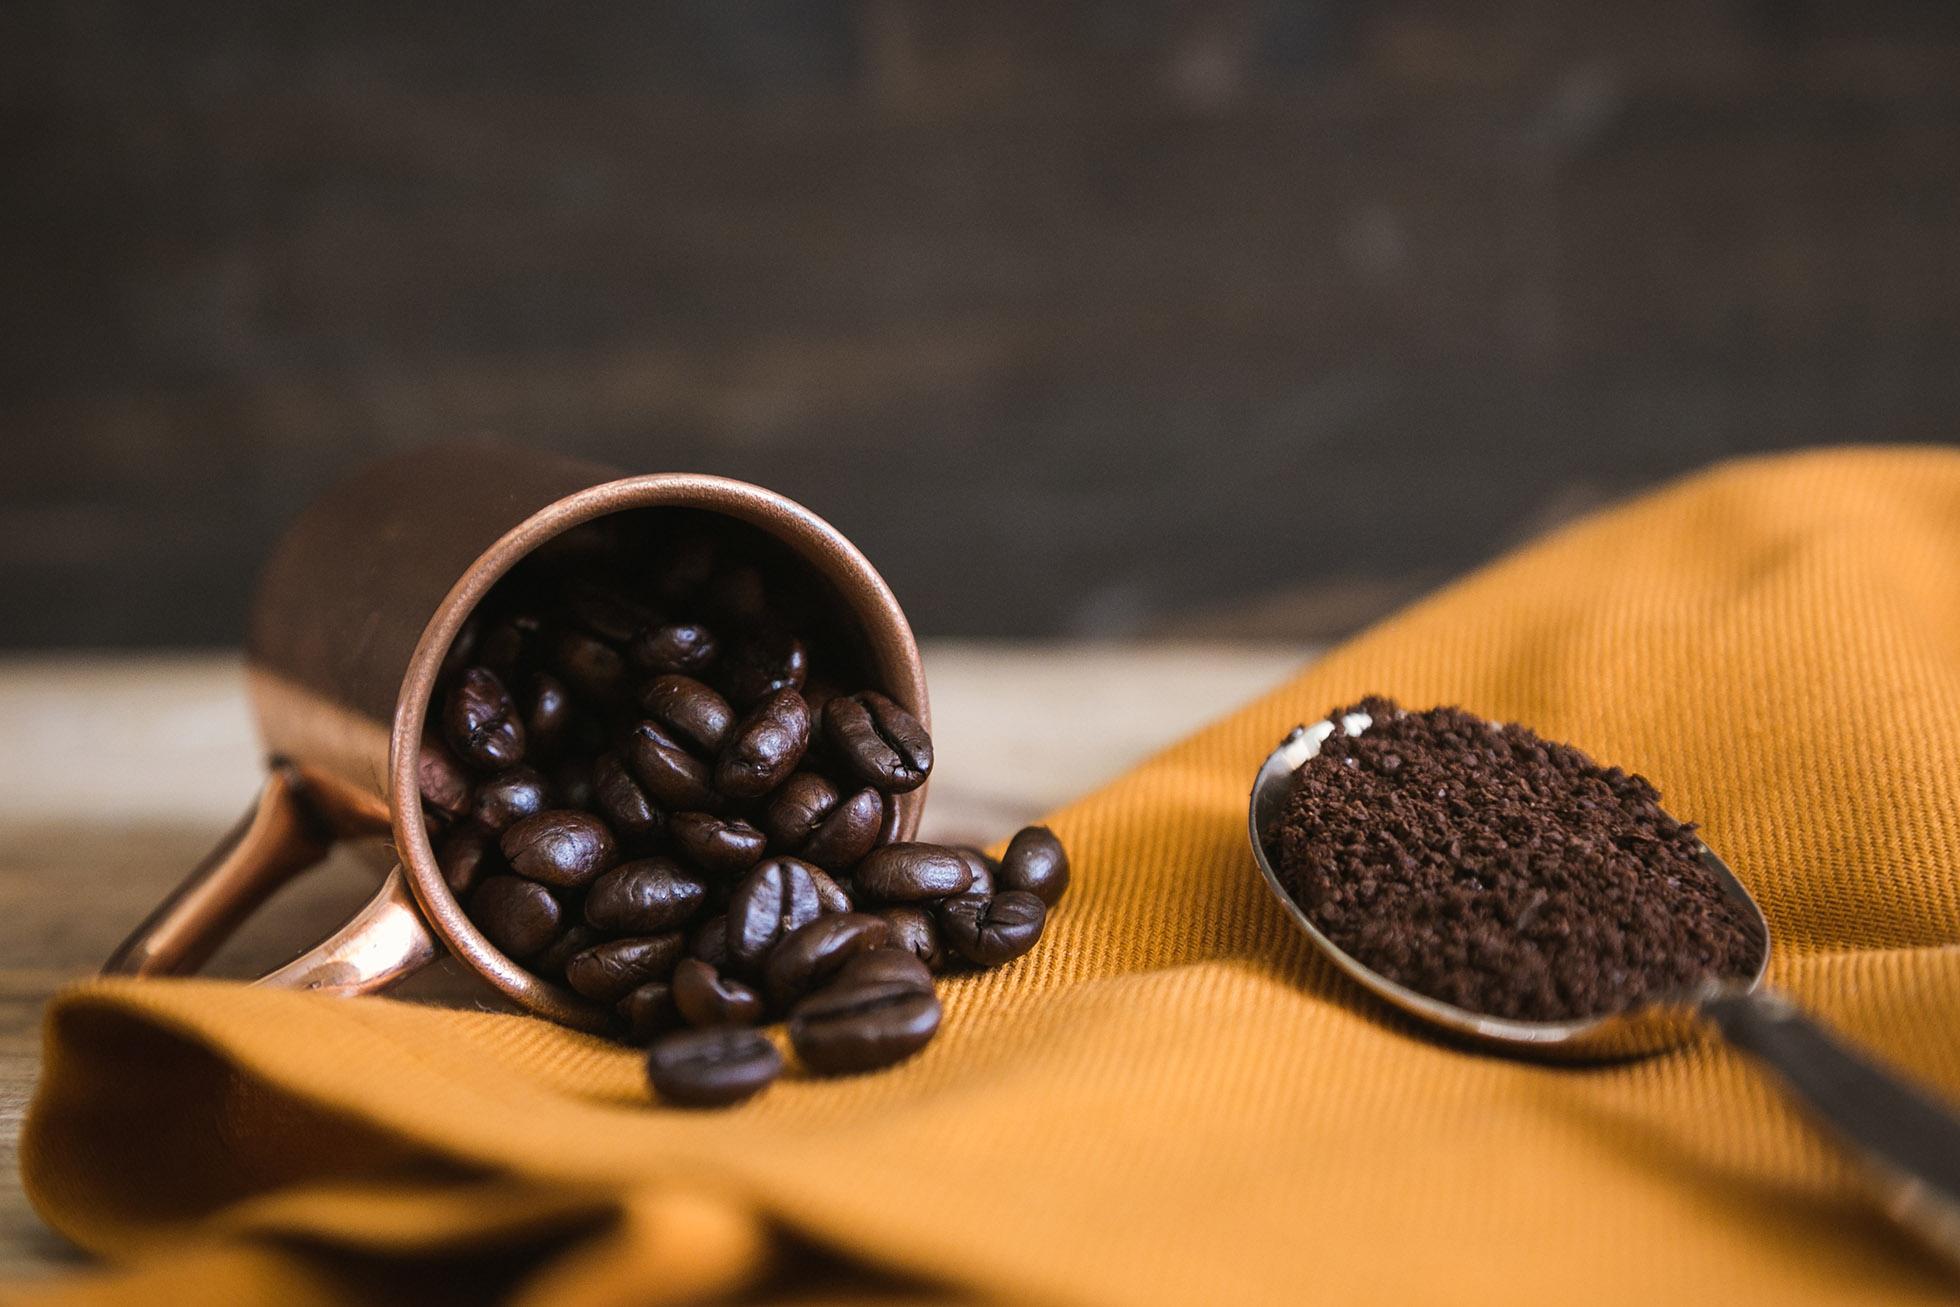 alicia bruce click daily project coffee